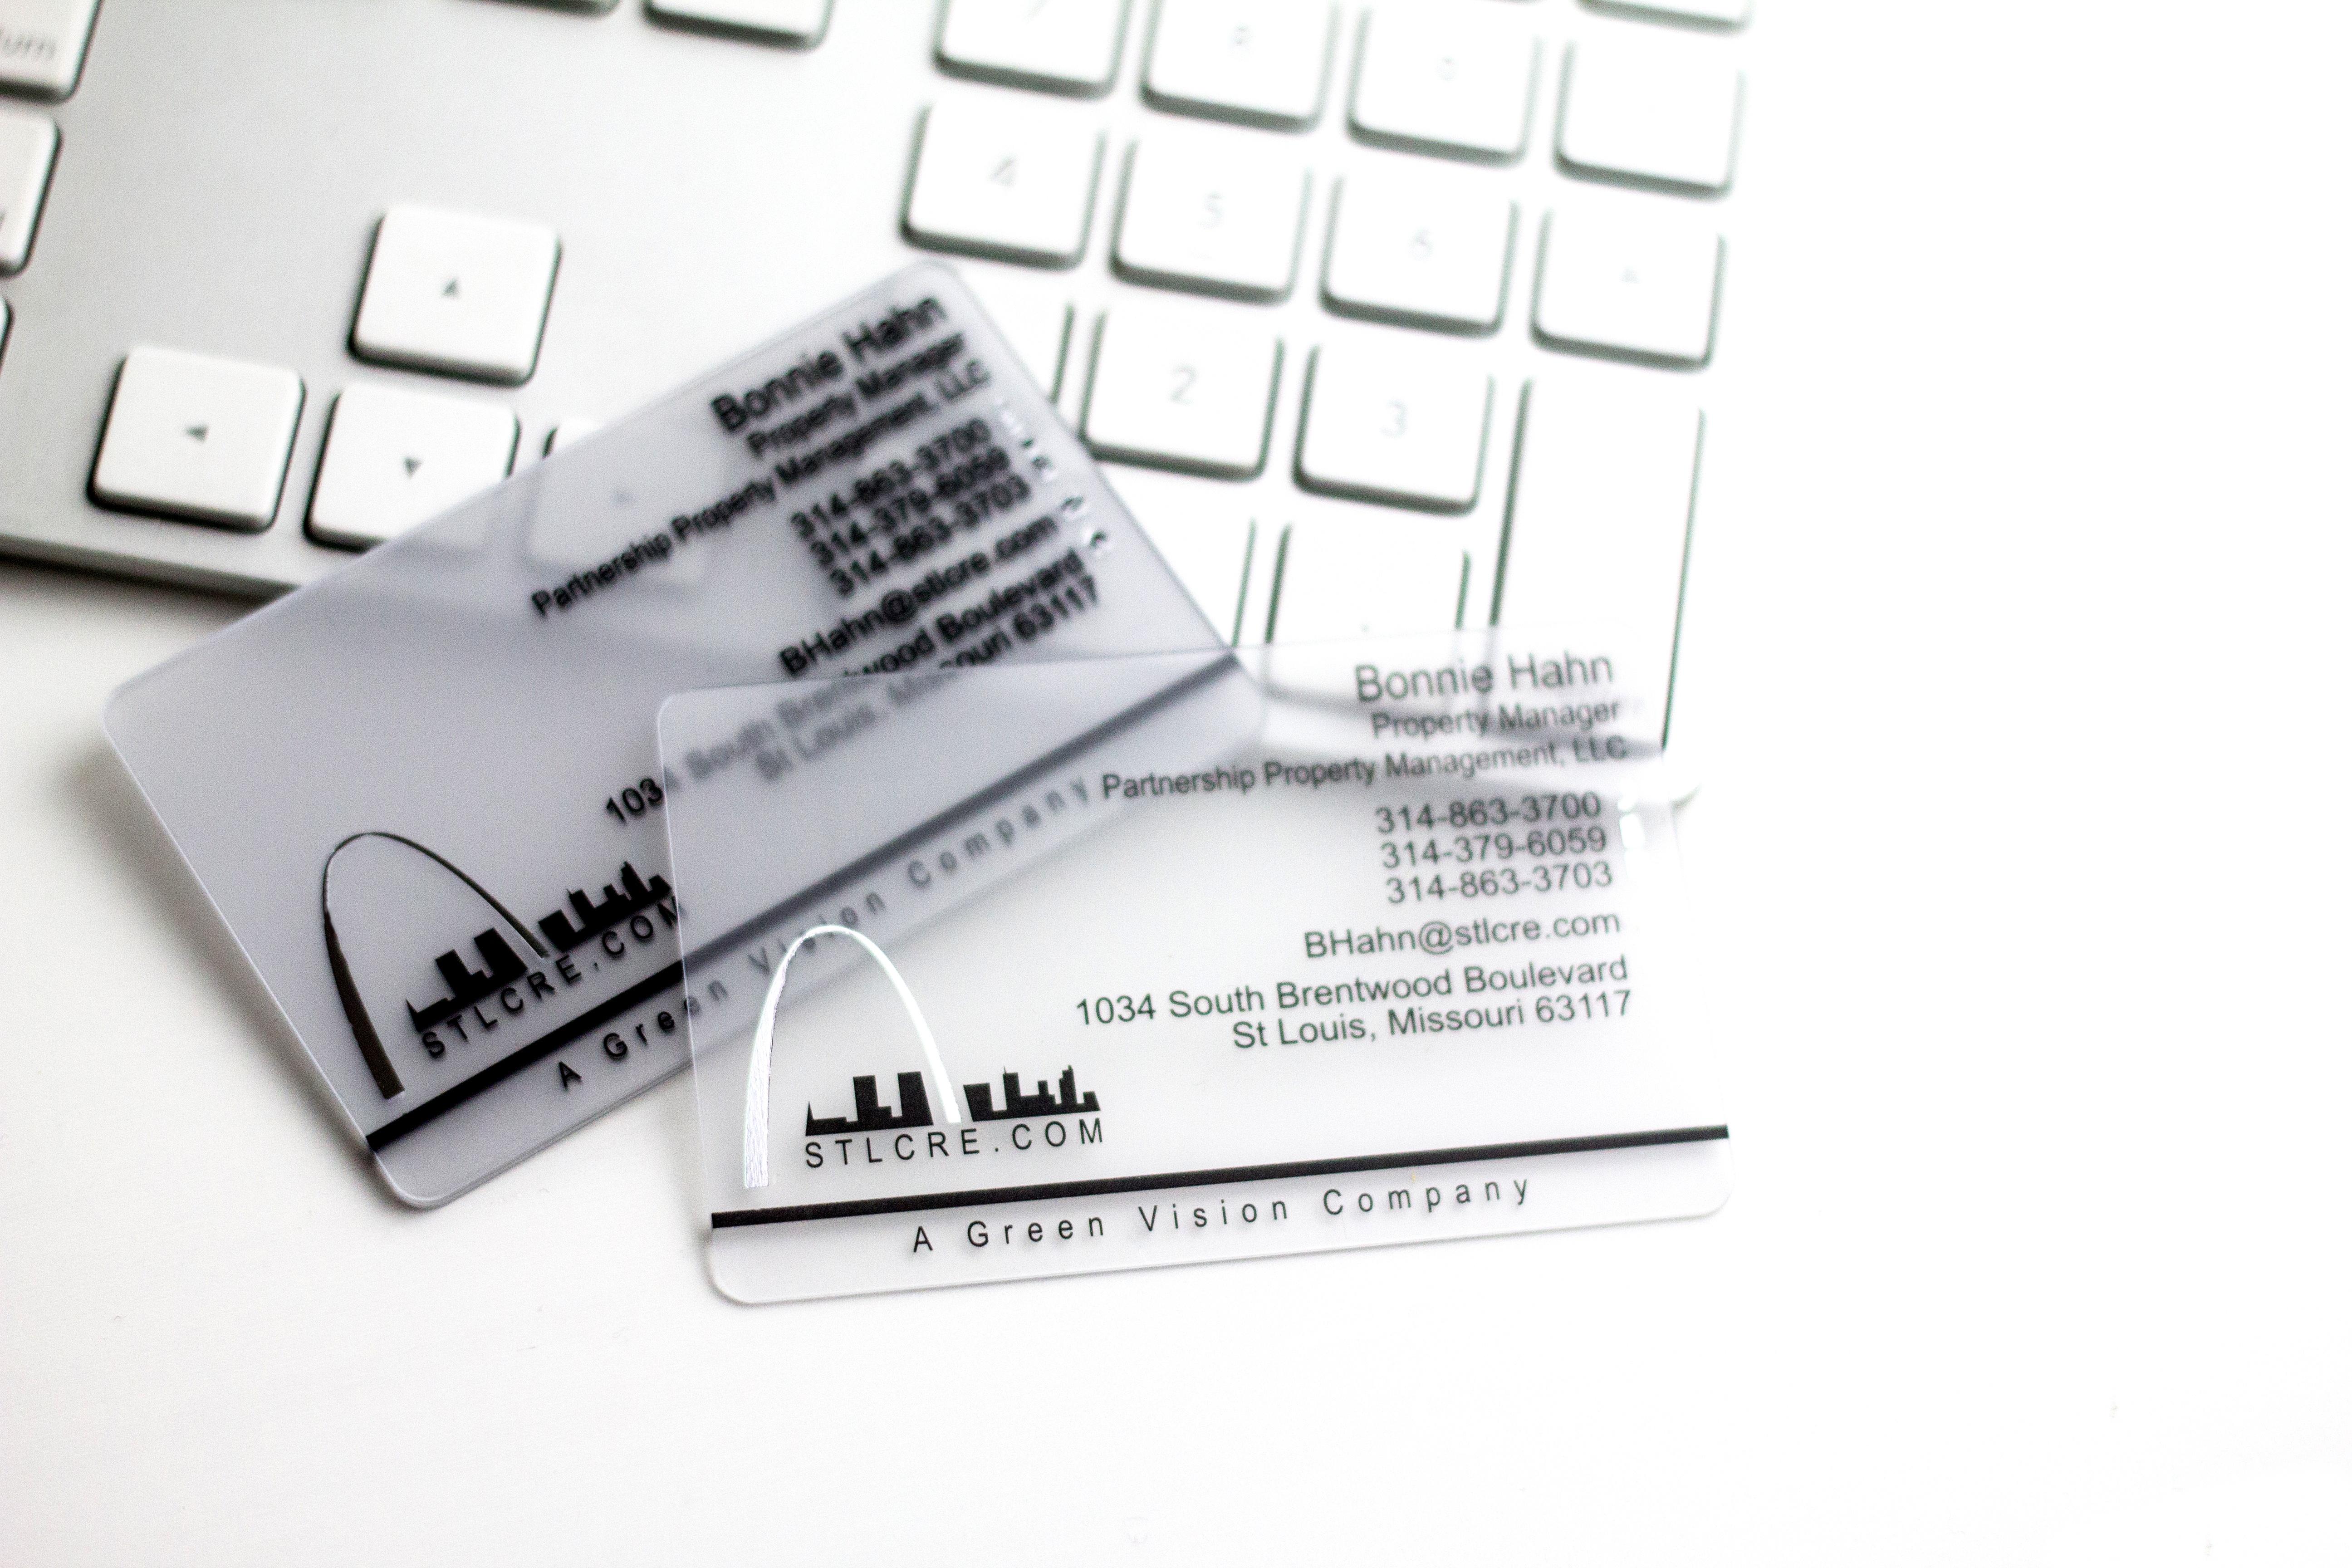 foil satin business cards